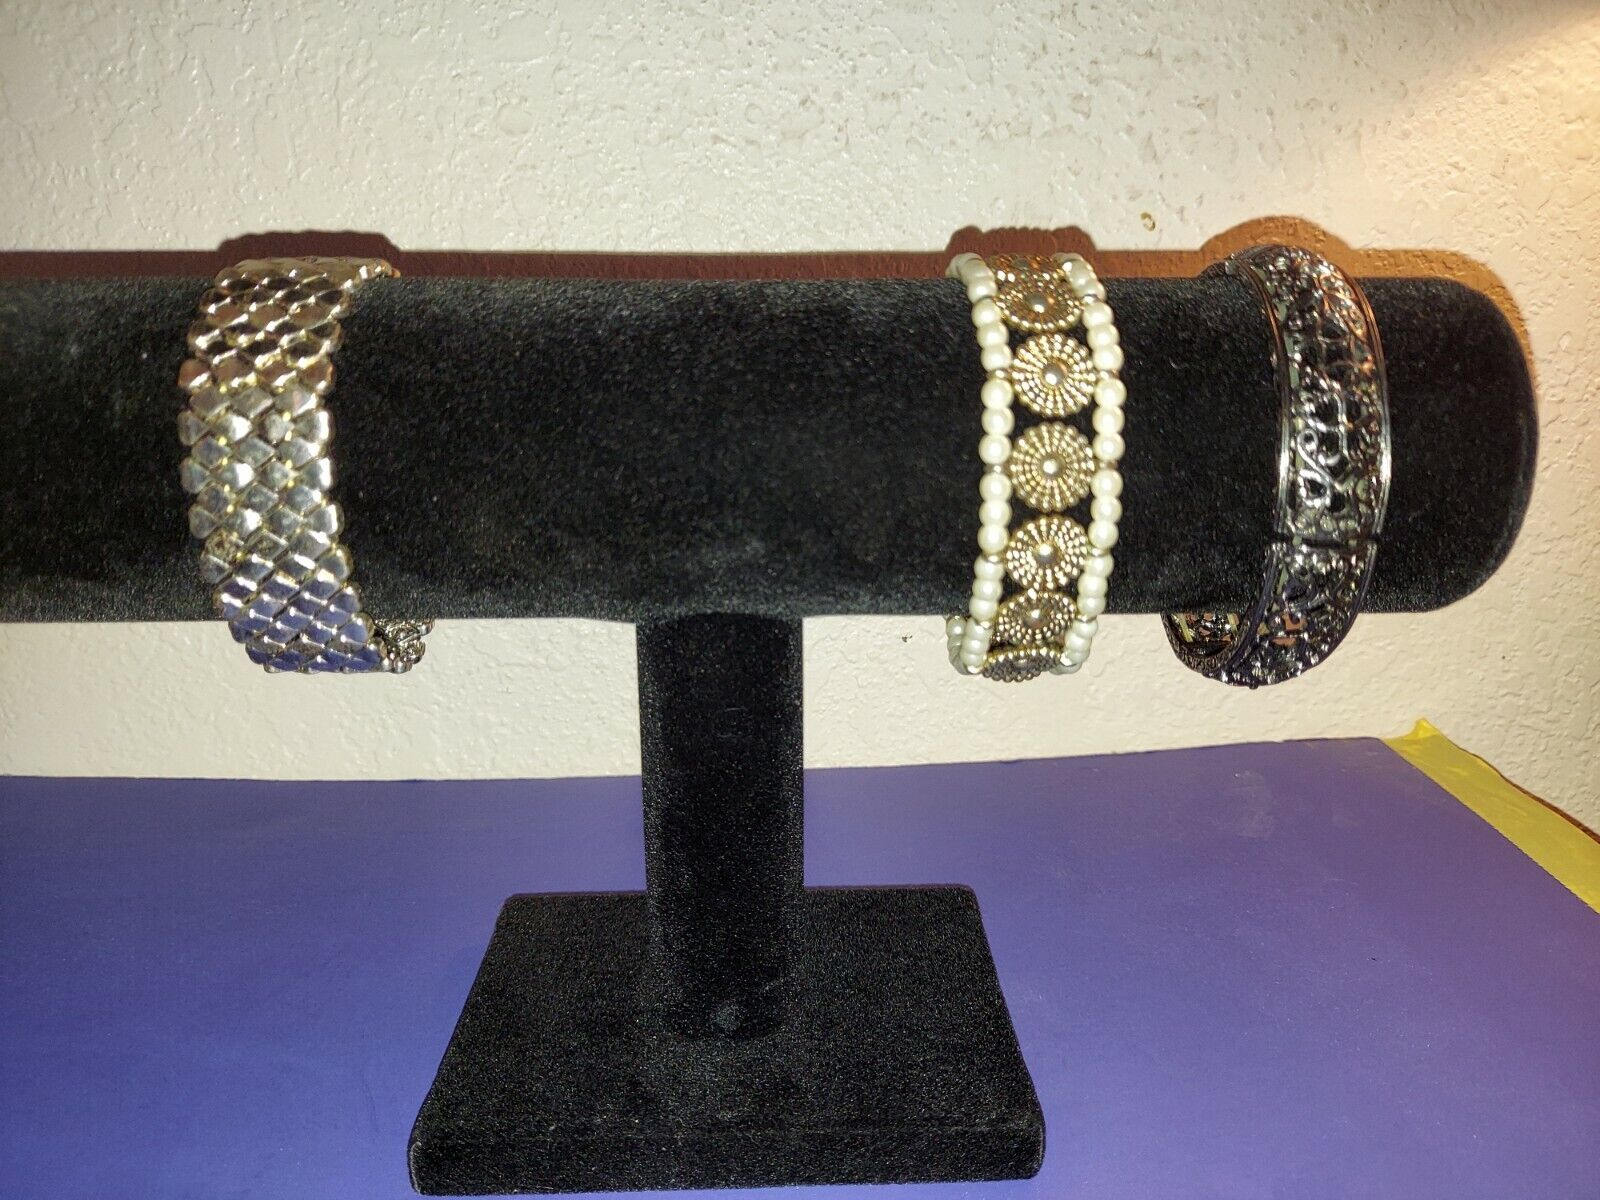 Bracelet Lot, Costume Jewelry - image 1